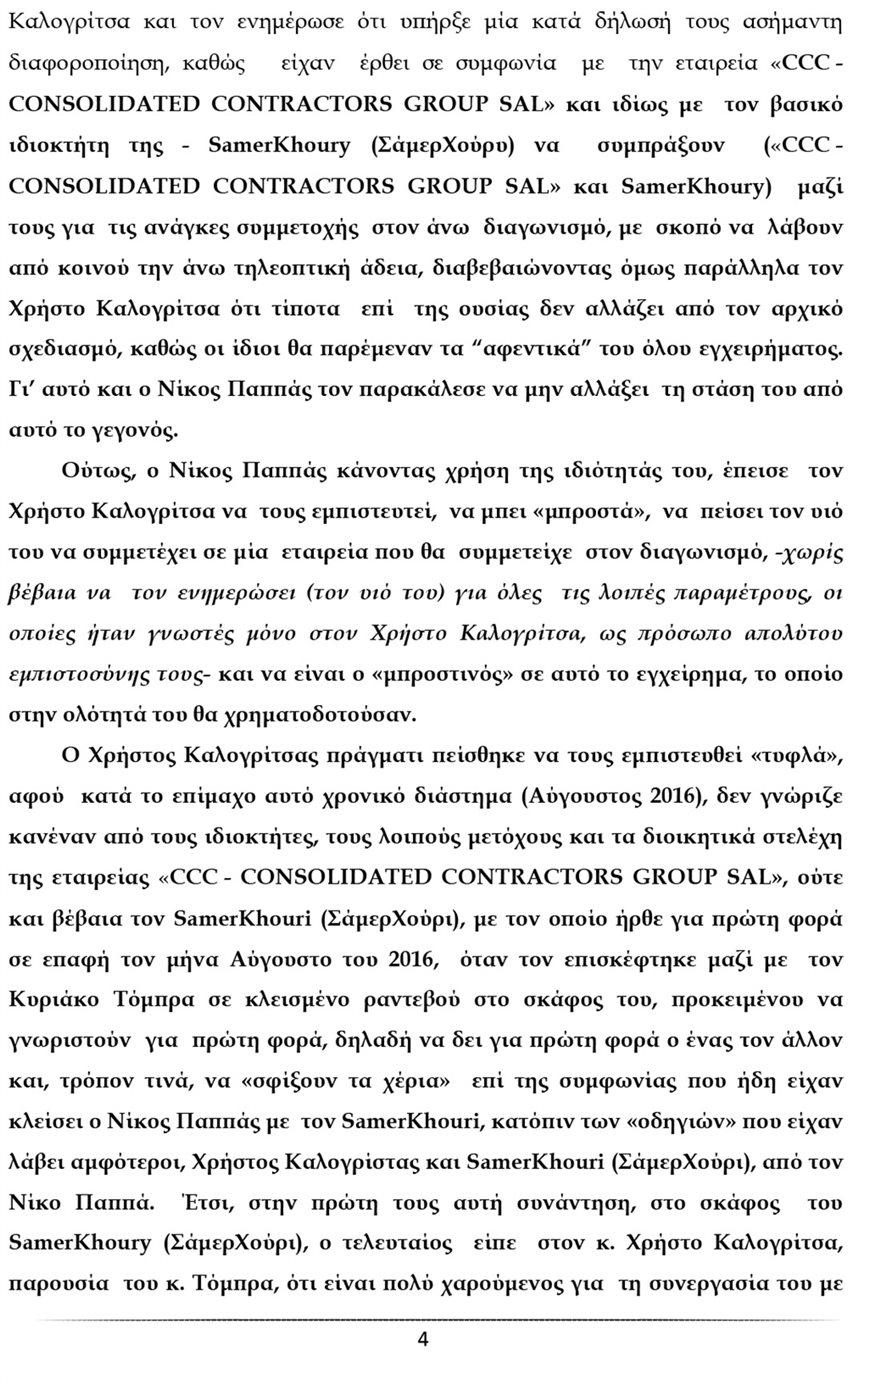 ypomnima-4